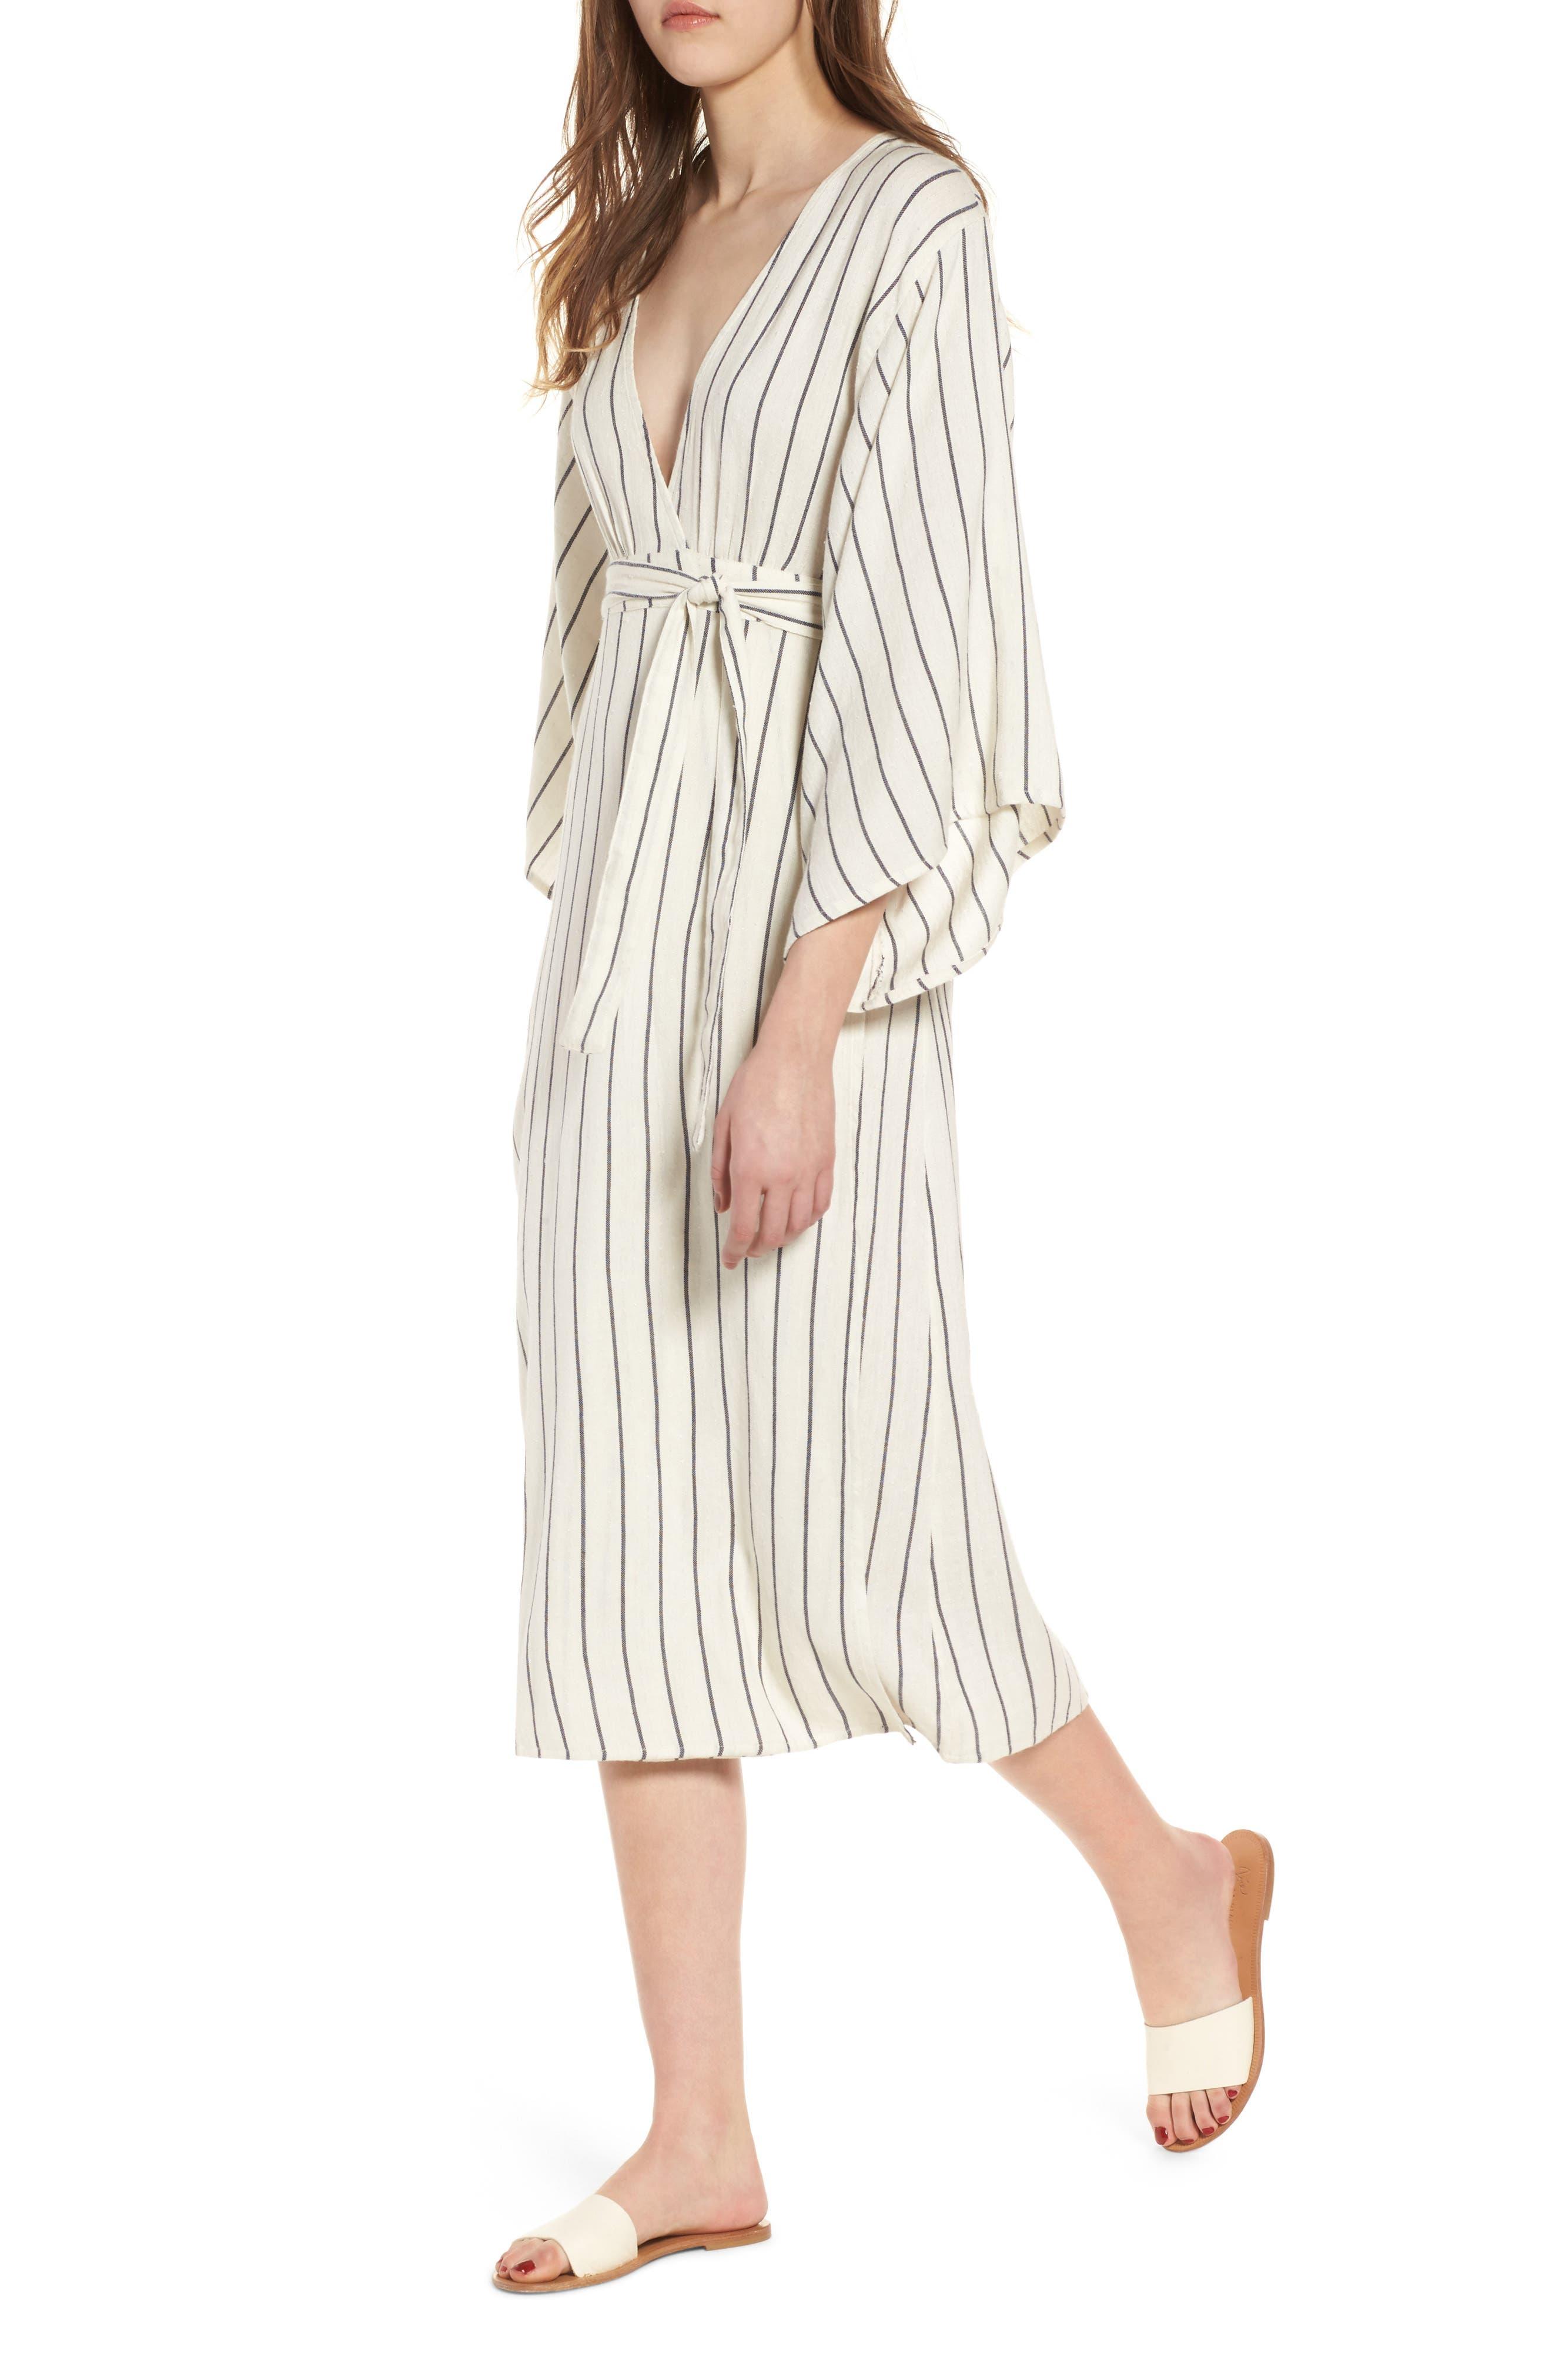 Robe Life Striped Midi Dress,                             Main thumbnail 1, color,                             190